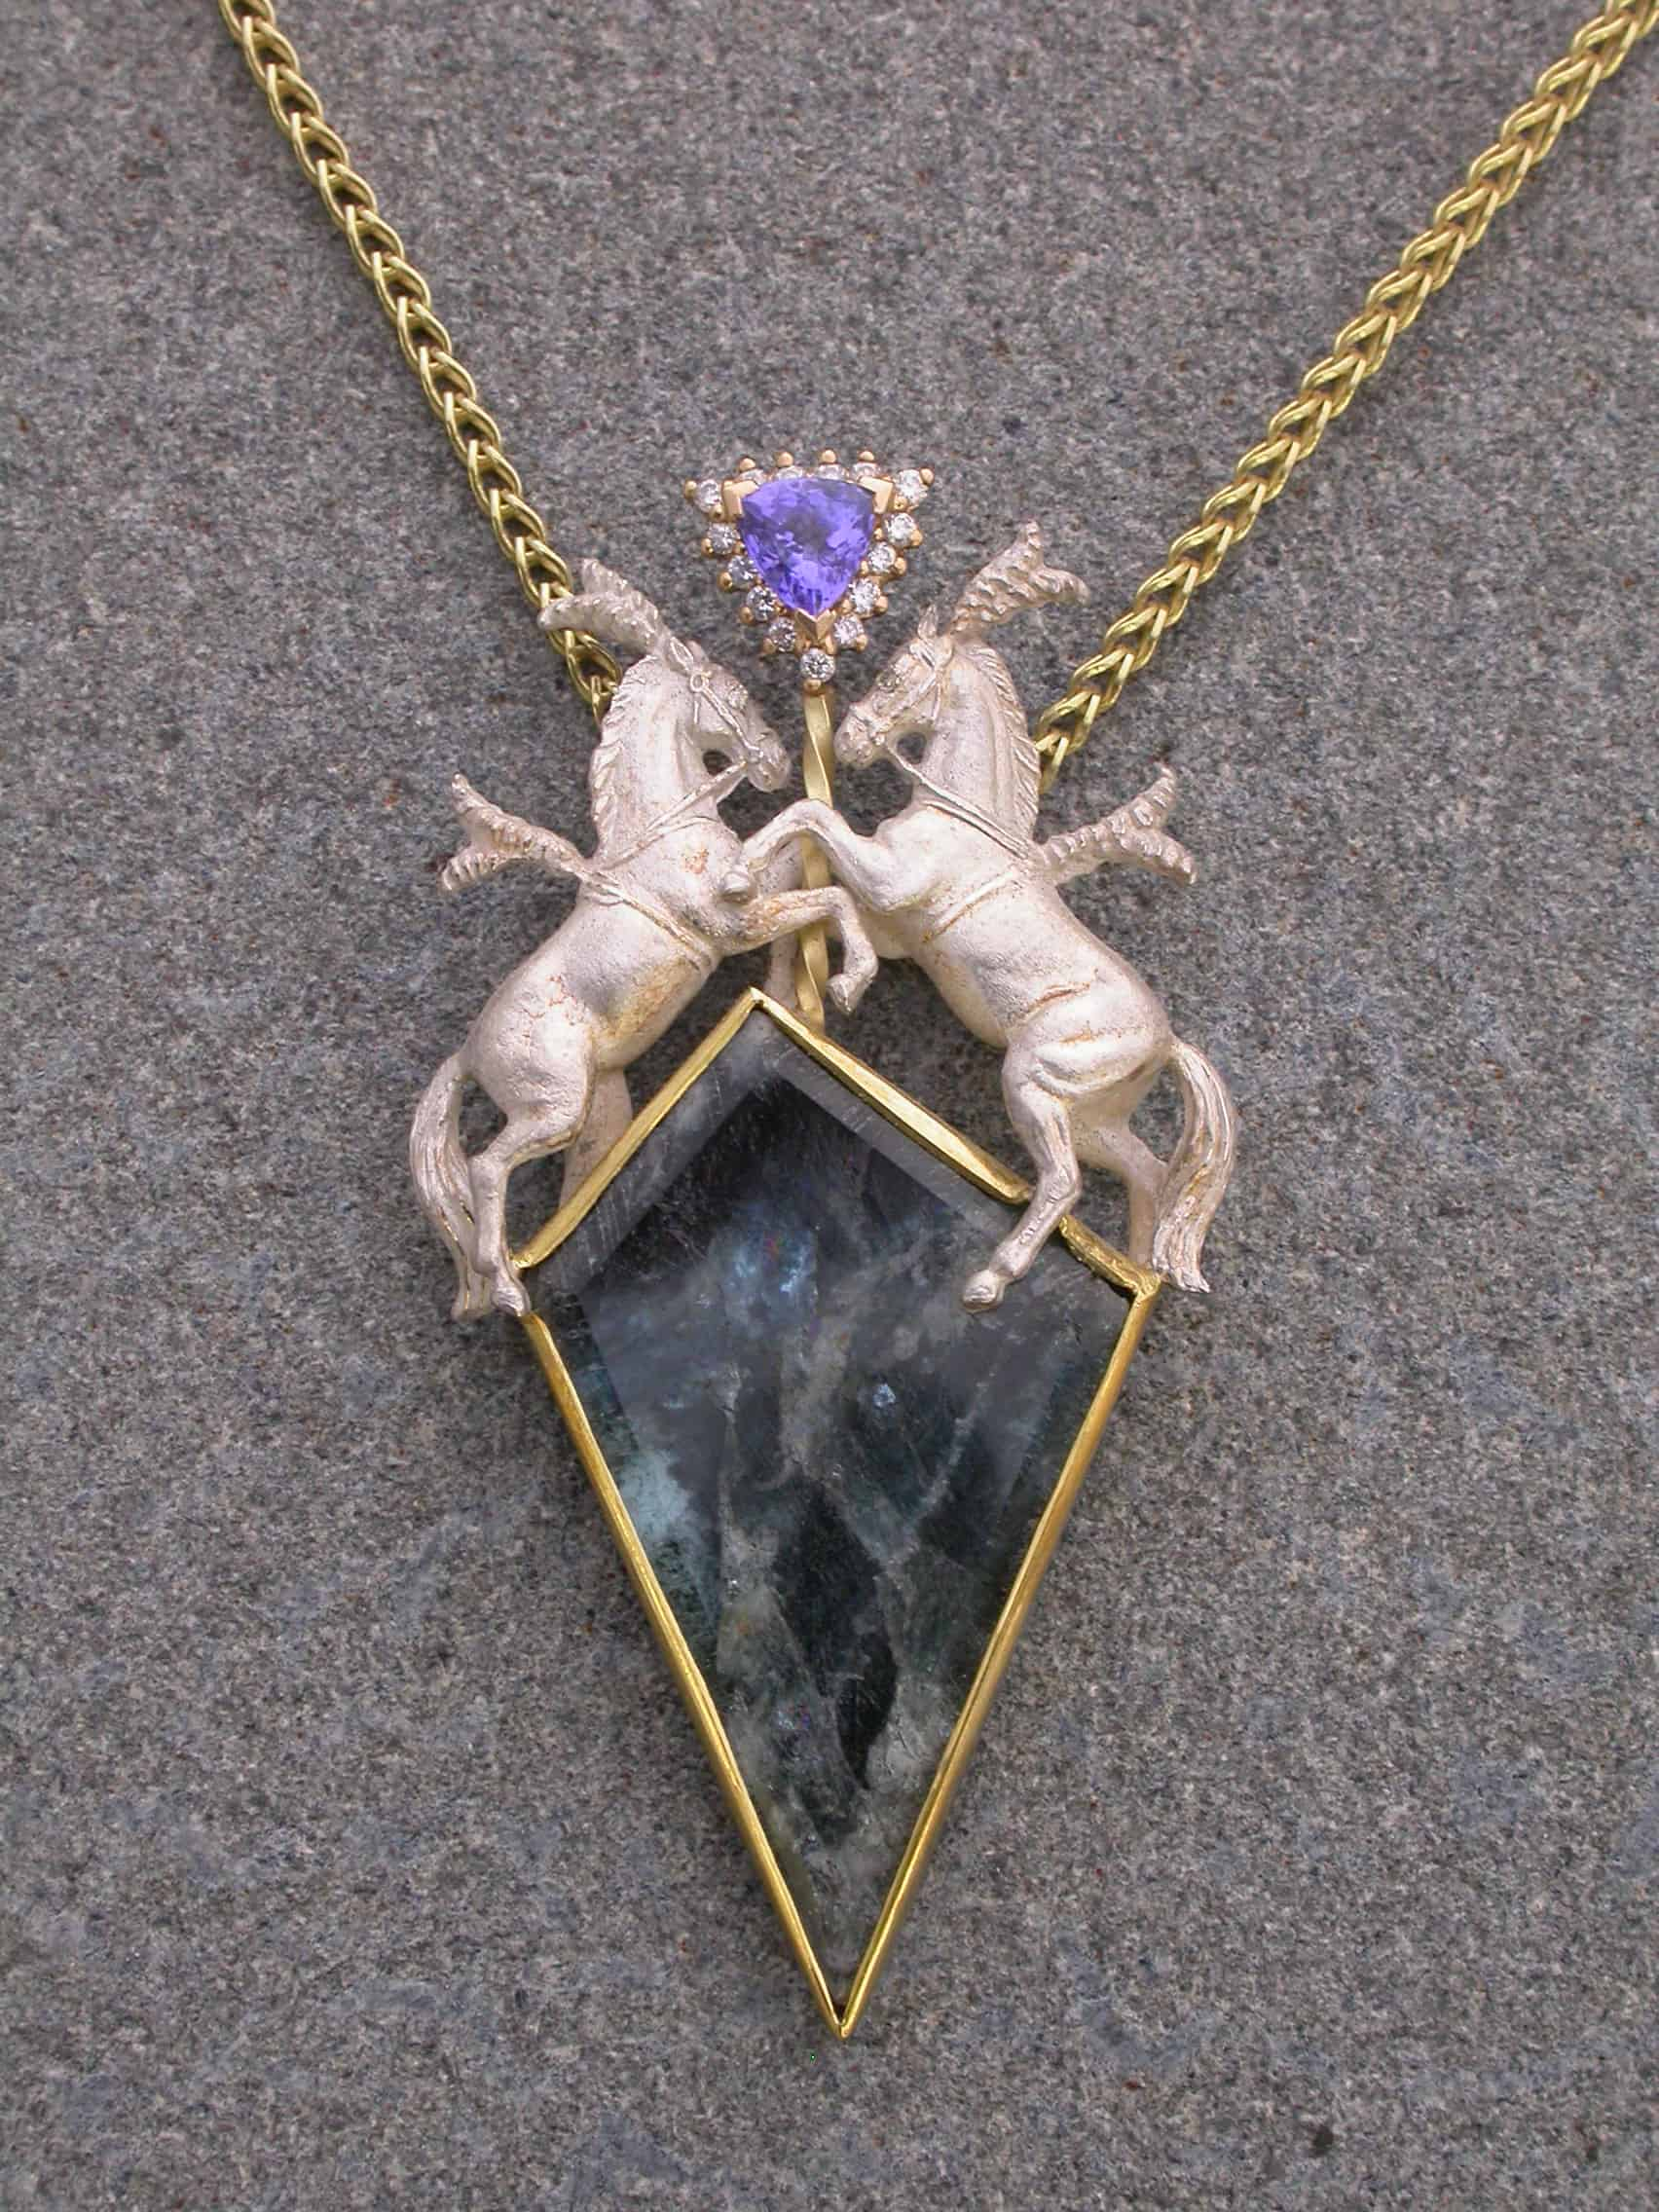 Unique necklaces horses, aquamarine , tanzanite, diamonds, 18k gold, sterling silver